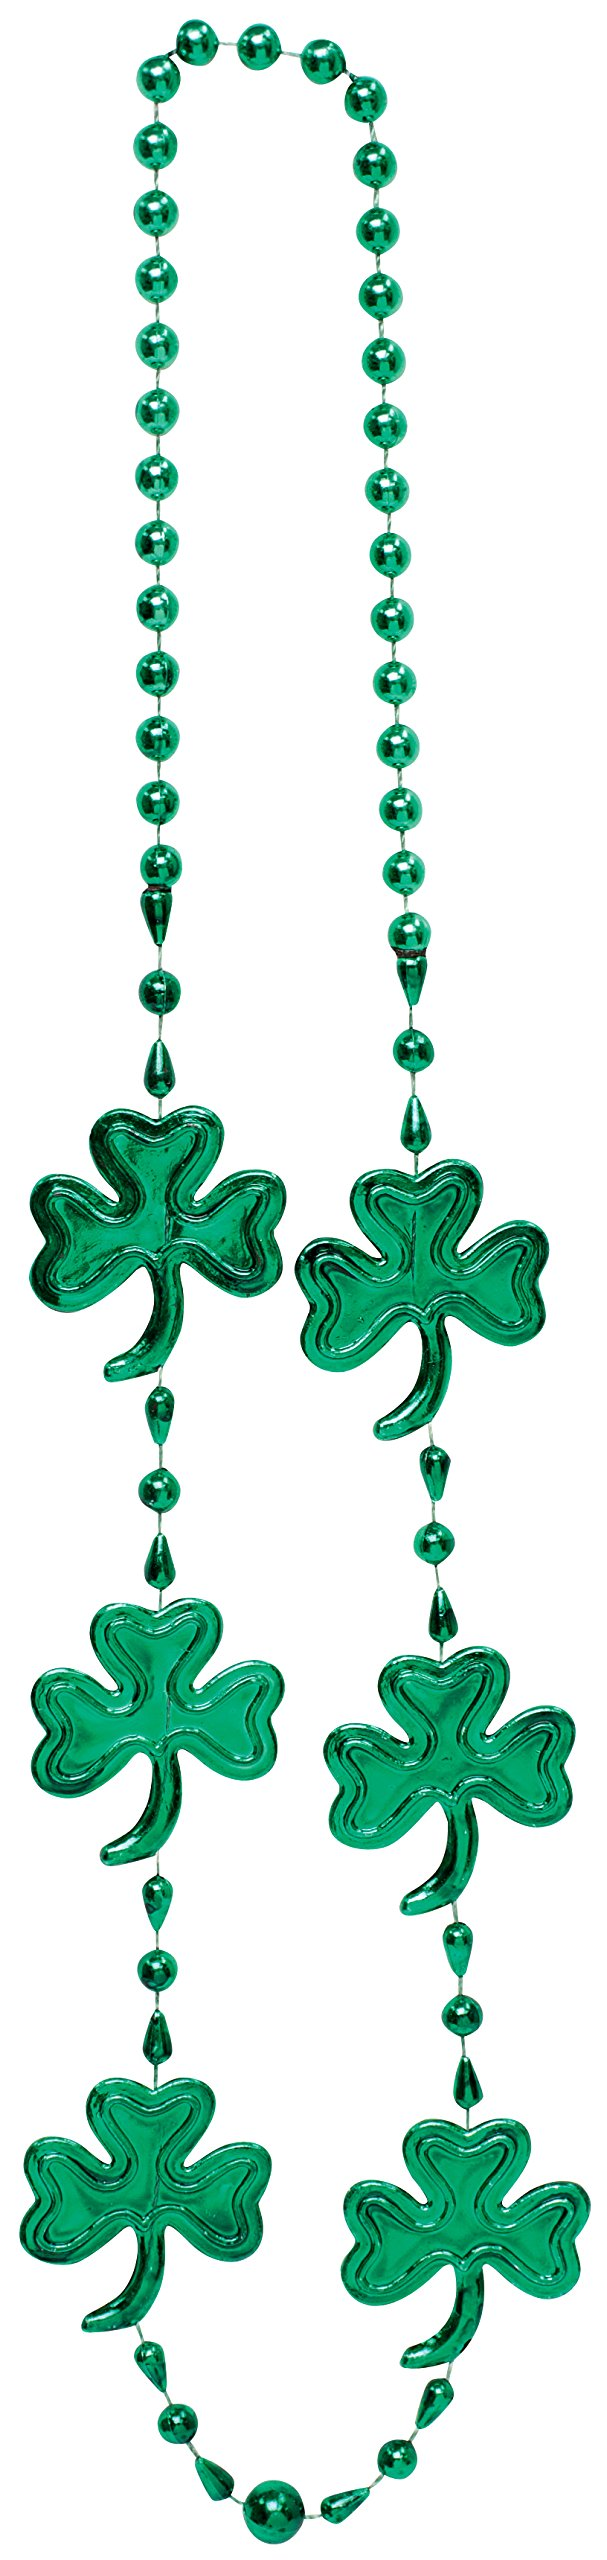 Creative Converting Shamrock Bead Necklace, 36-Inch